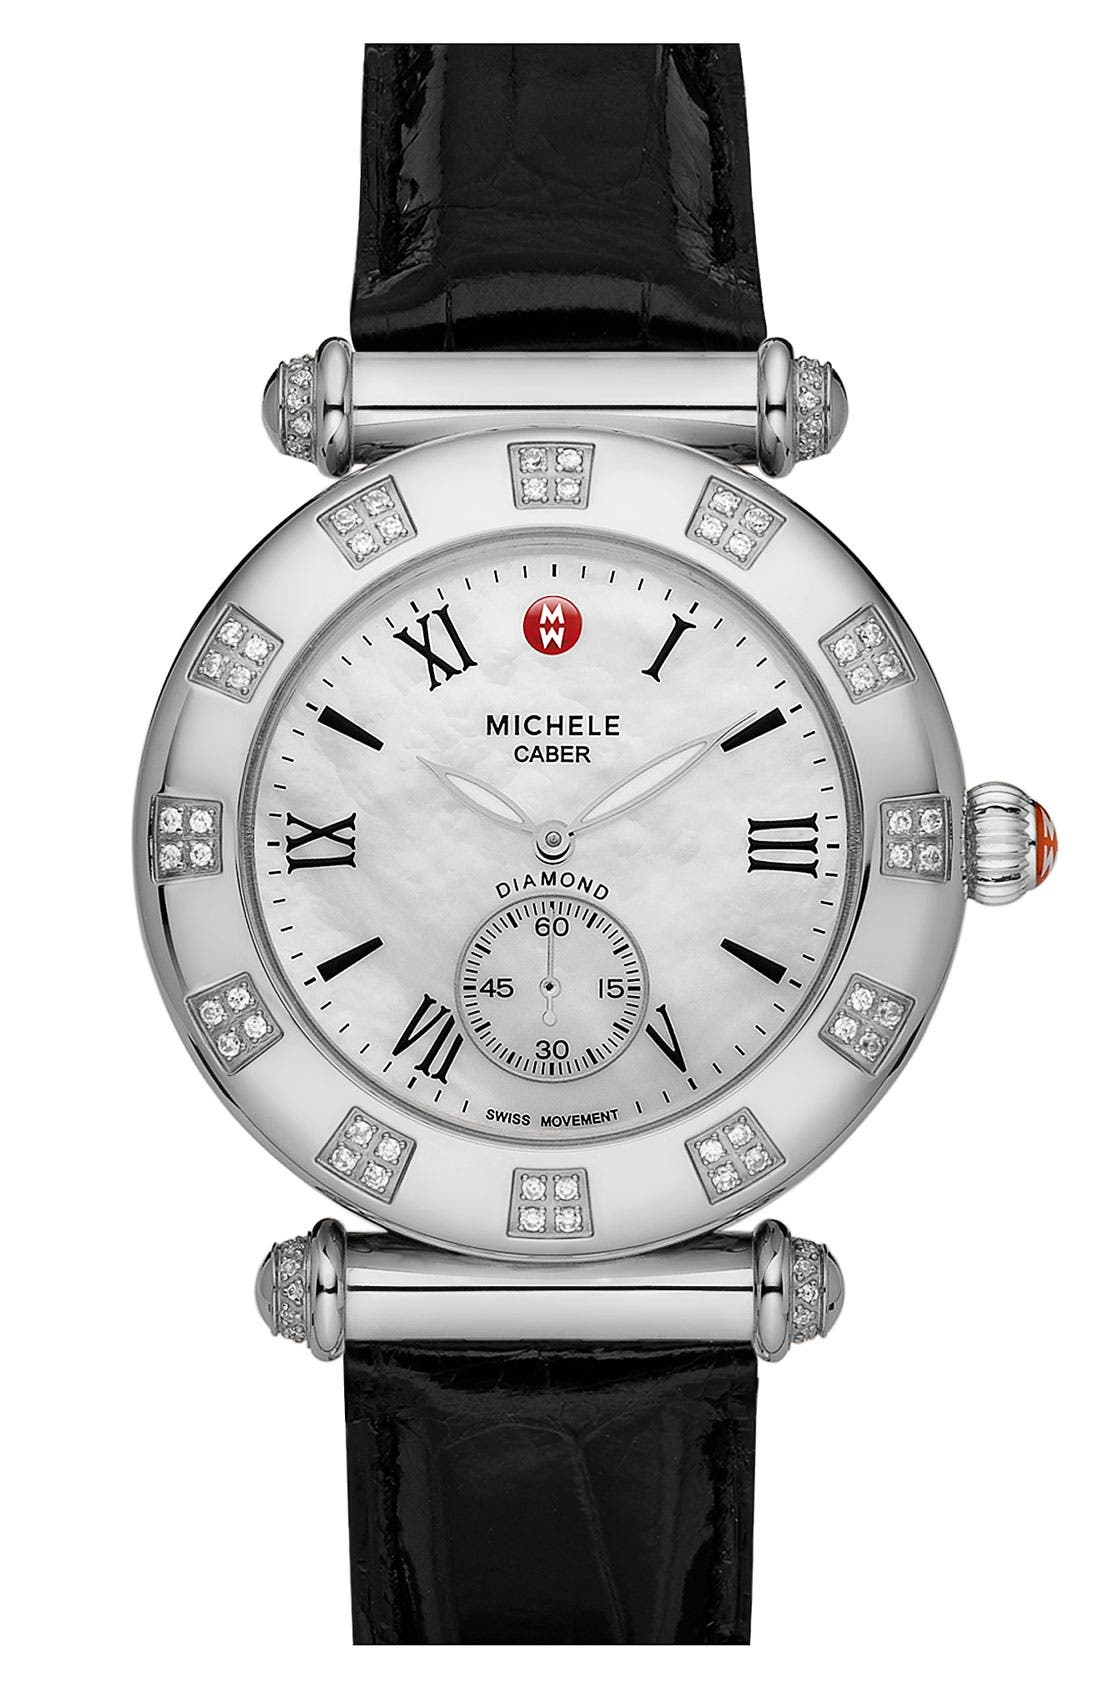 MICHELE 'Caber Atlas' Diamond Customizable Watch,                             Main thumbnail 1, color,                             040